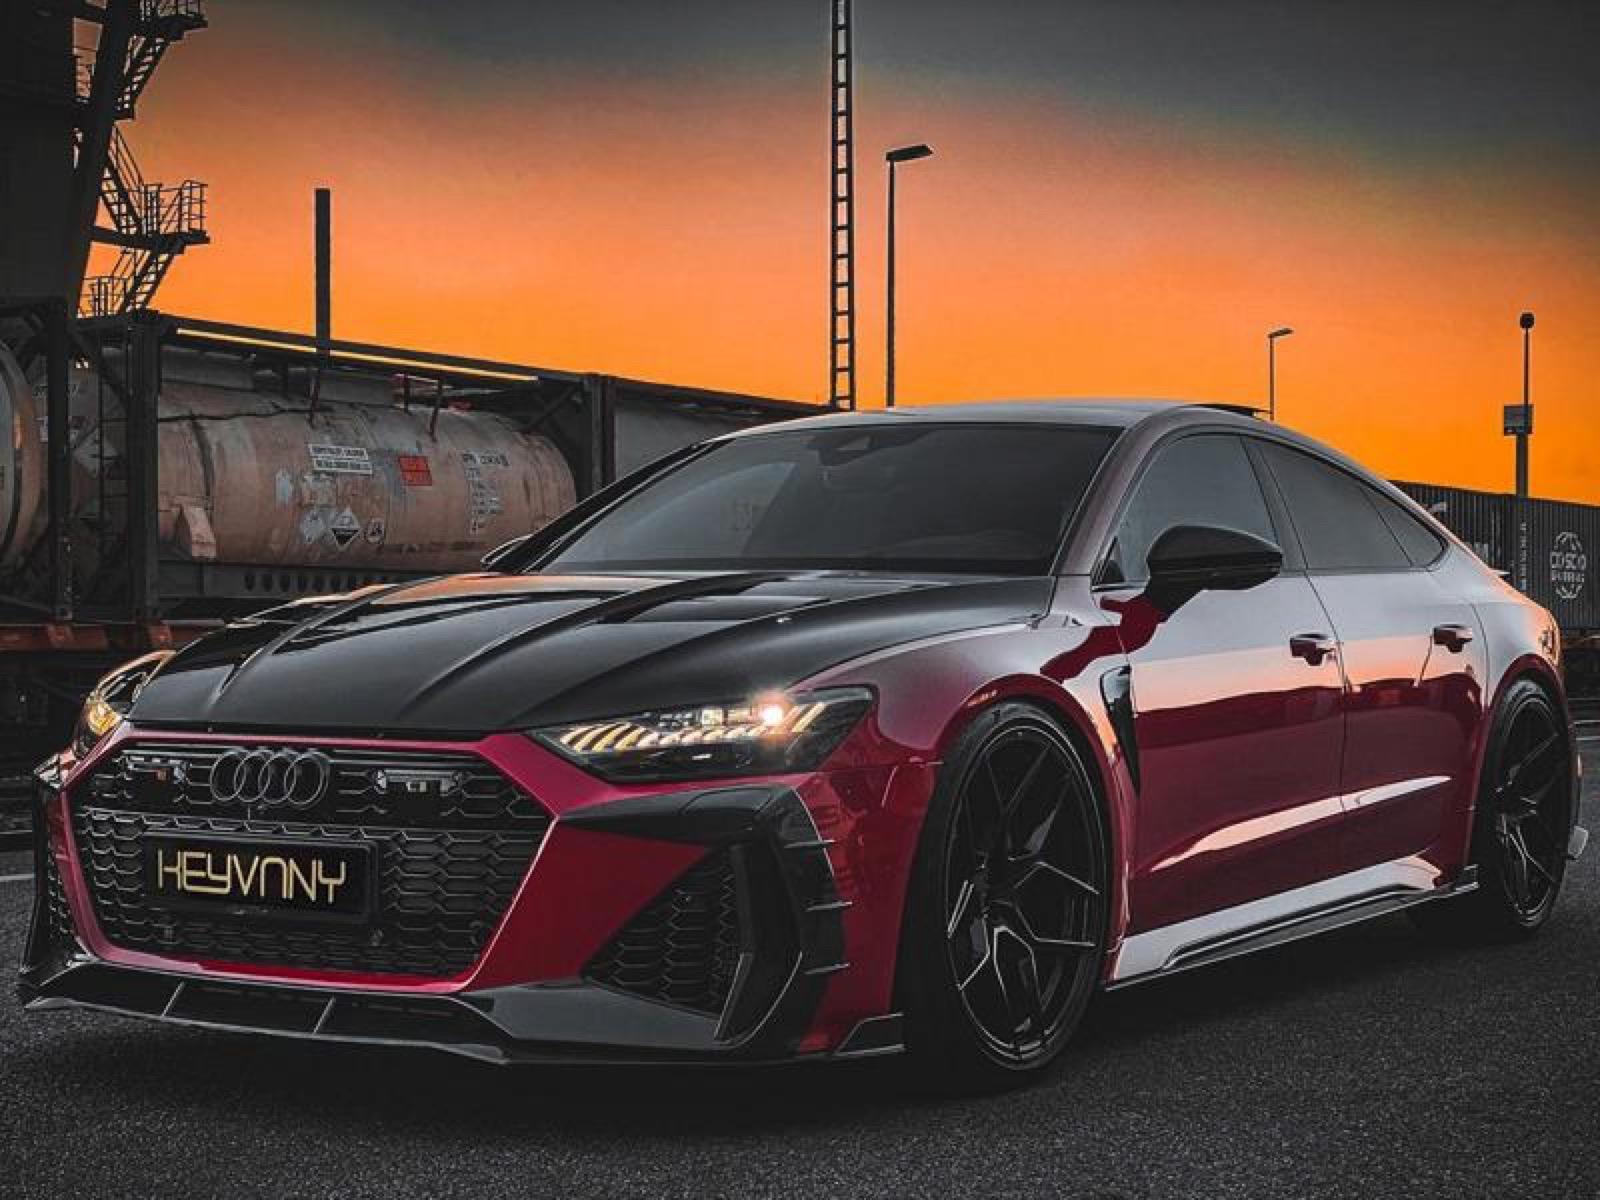 Audi-RS7-by-Keyvany-6